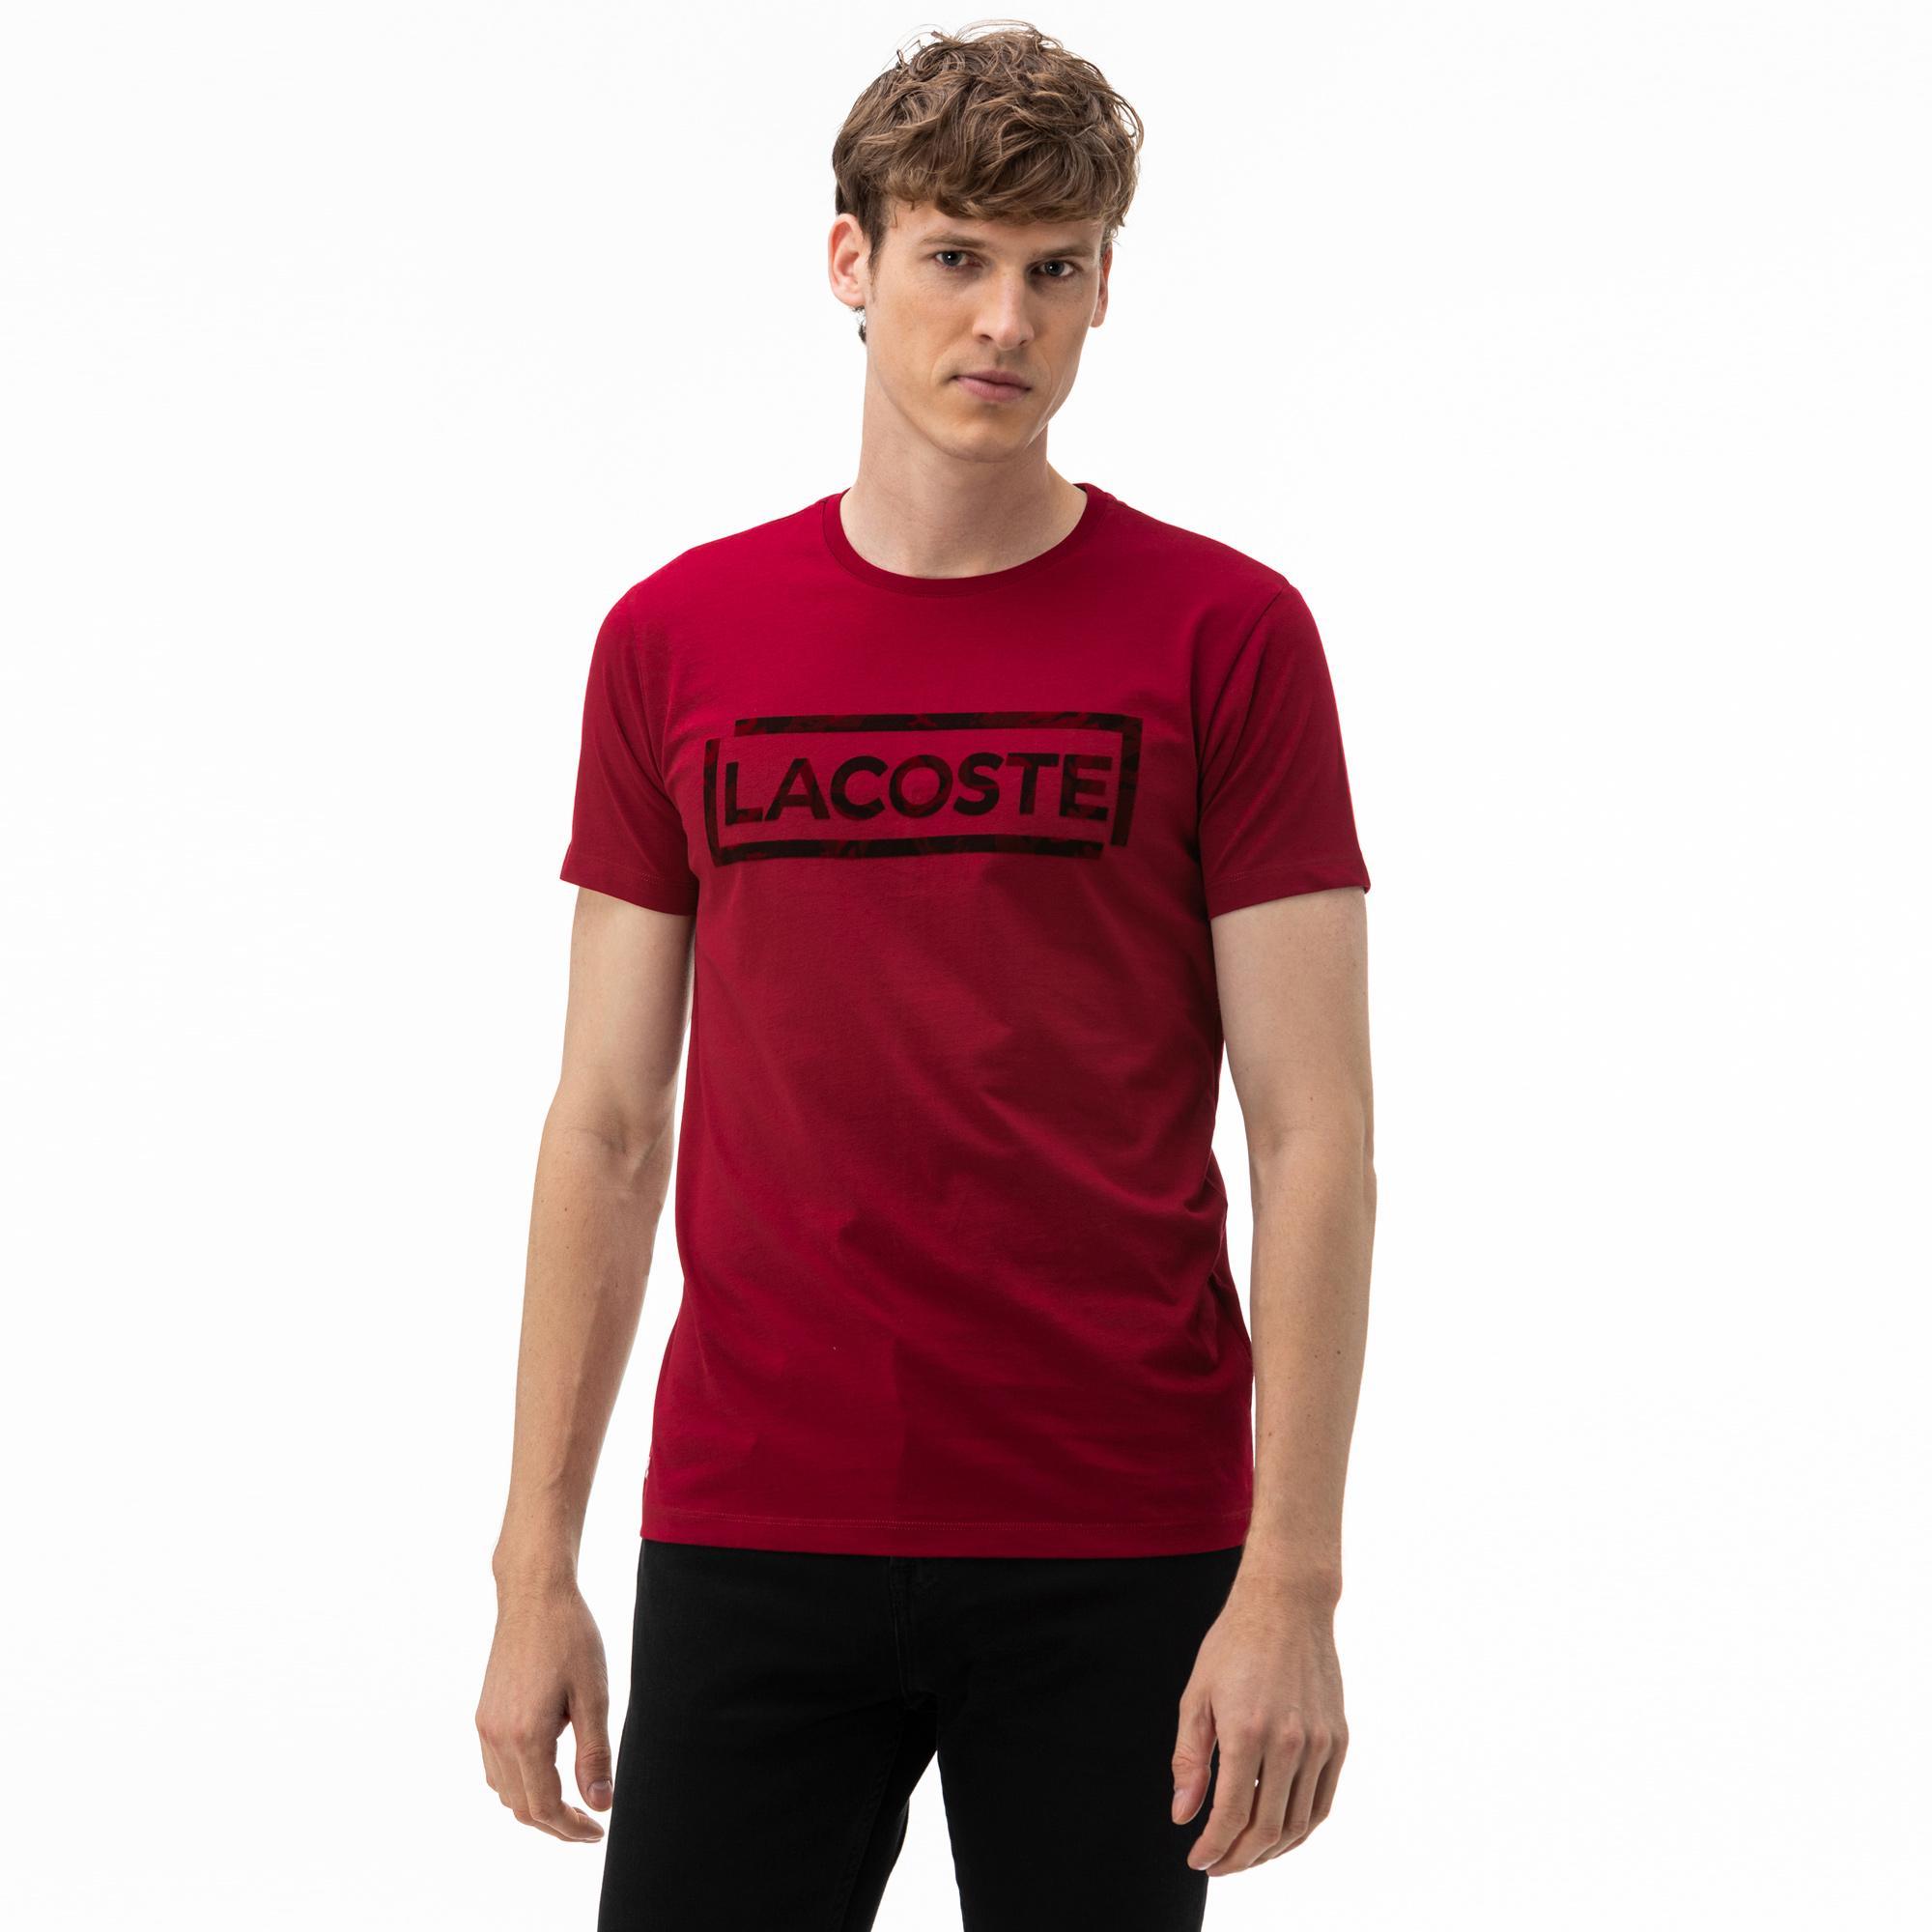 Lacoste Erkek Bisiklet Yaka Baskılı Bordo T-Shirt